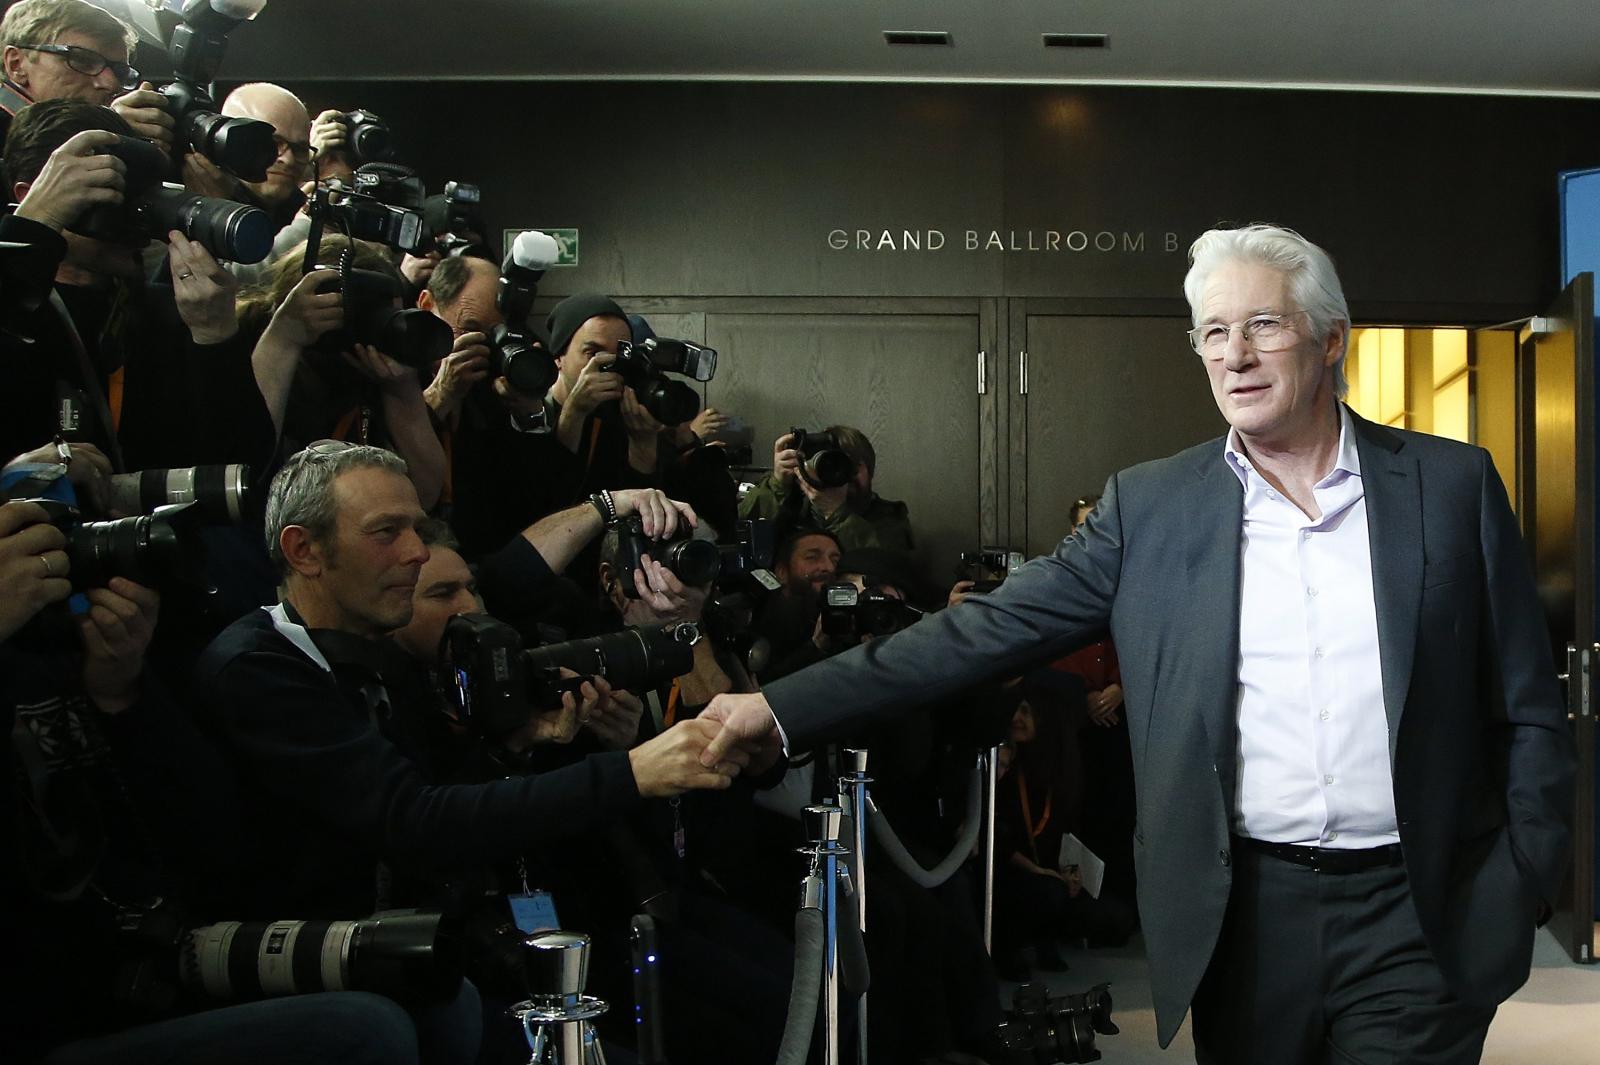 Richard Gere na 67. Berlińskim Festiwalu Filmowym. Fot. PAP/EPA/GUILLAUME HORCAJUELO Dostawca: PAP/EPA.